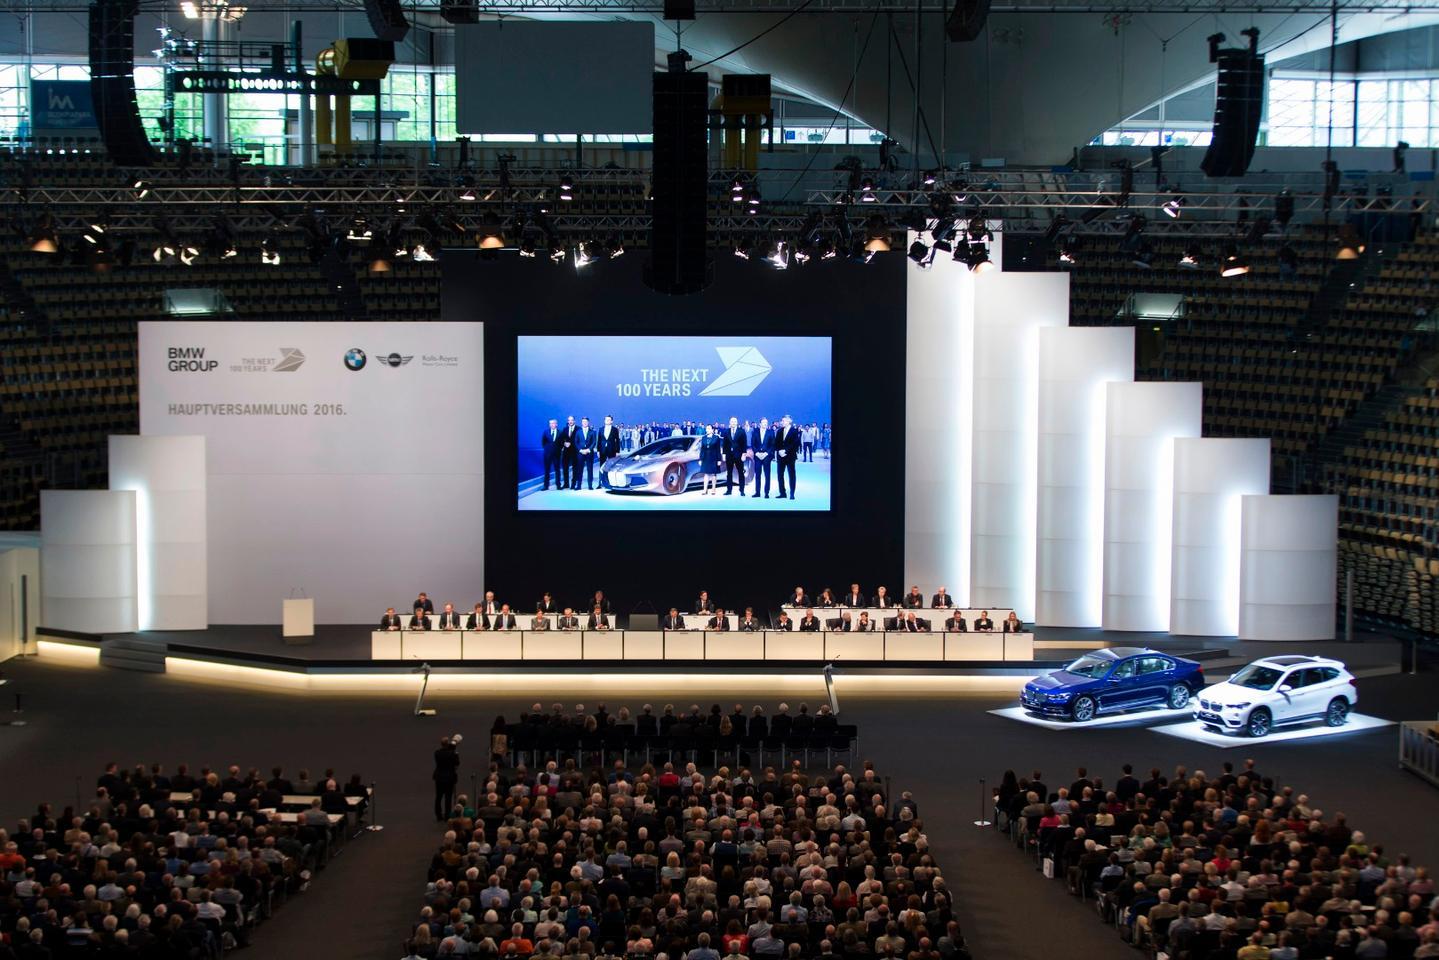 BMW's shareholder meeting